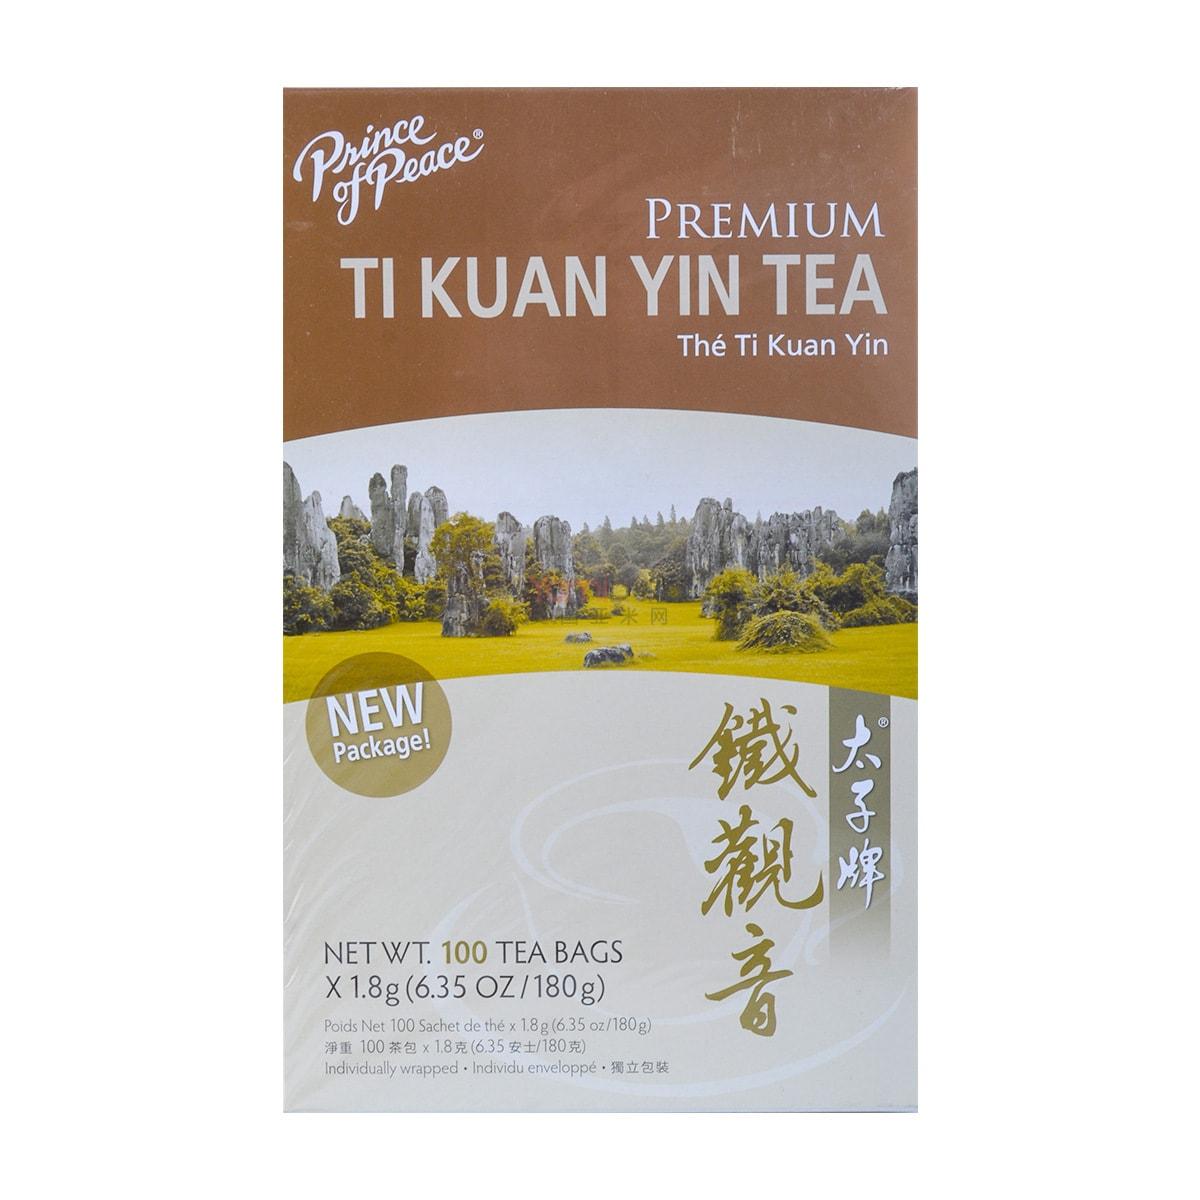 PRINCE OF PEACE Premium Ti Kuan Yin Tea 100 Bags 180g